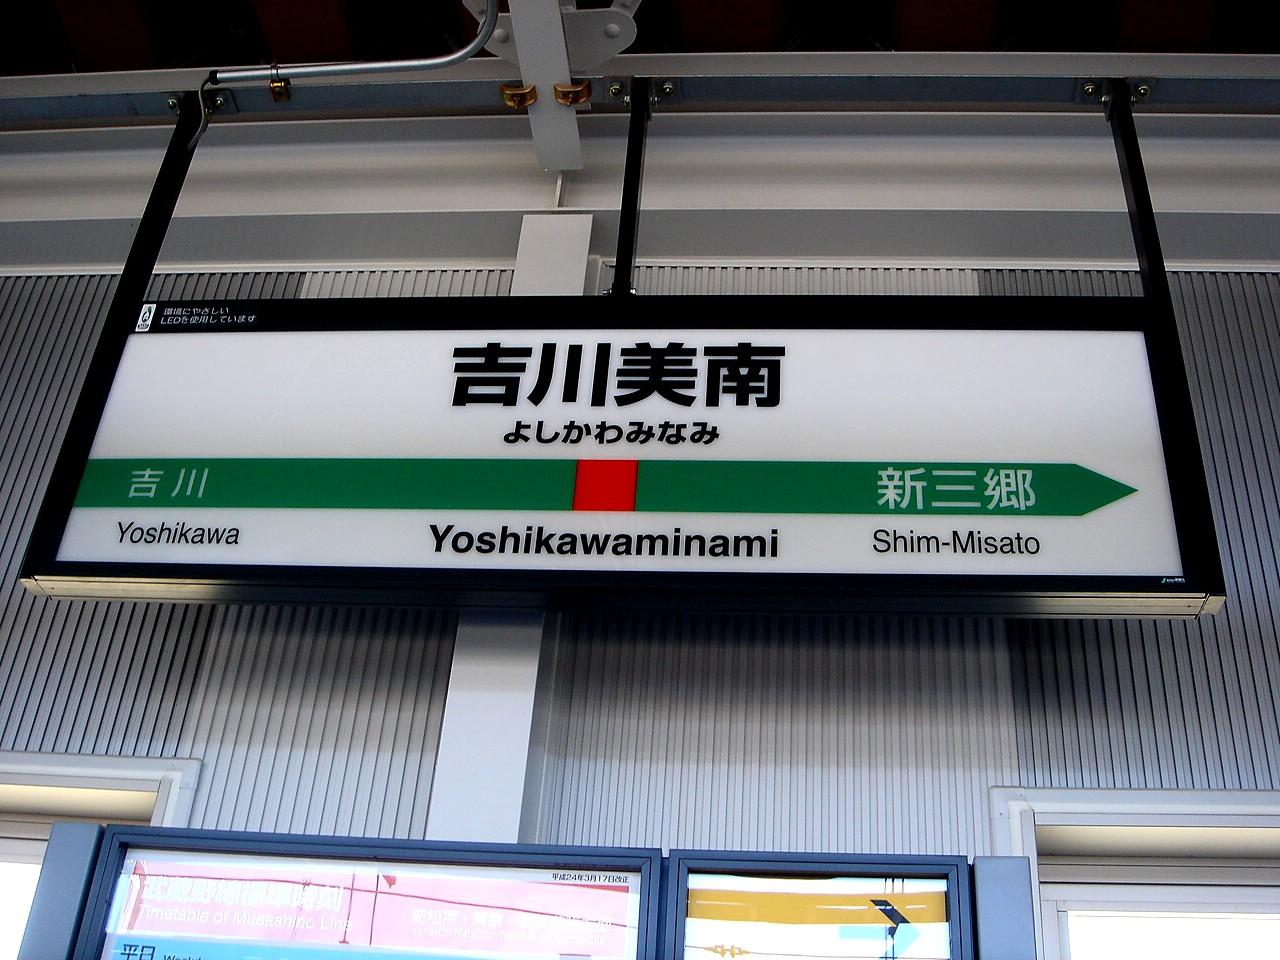 20120325_JR東日本_JR武蔵野線_JR吉川美南駅_開業_095... そのJR武蔵野線